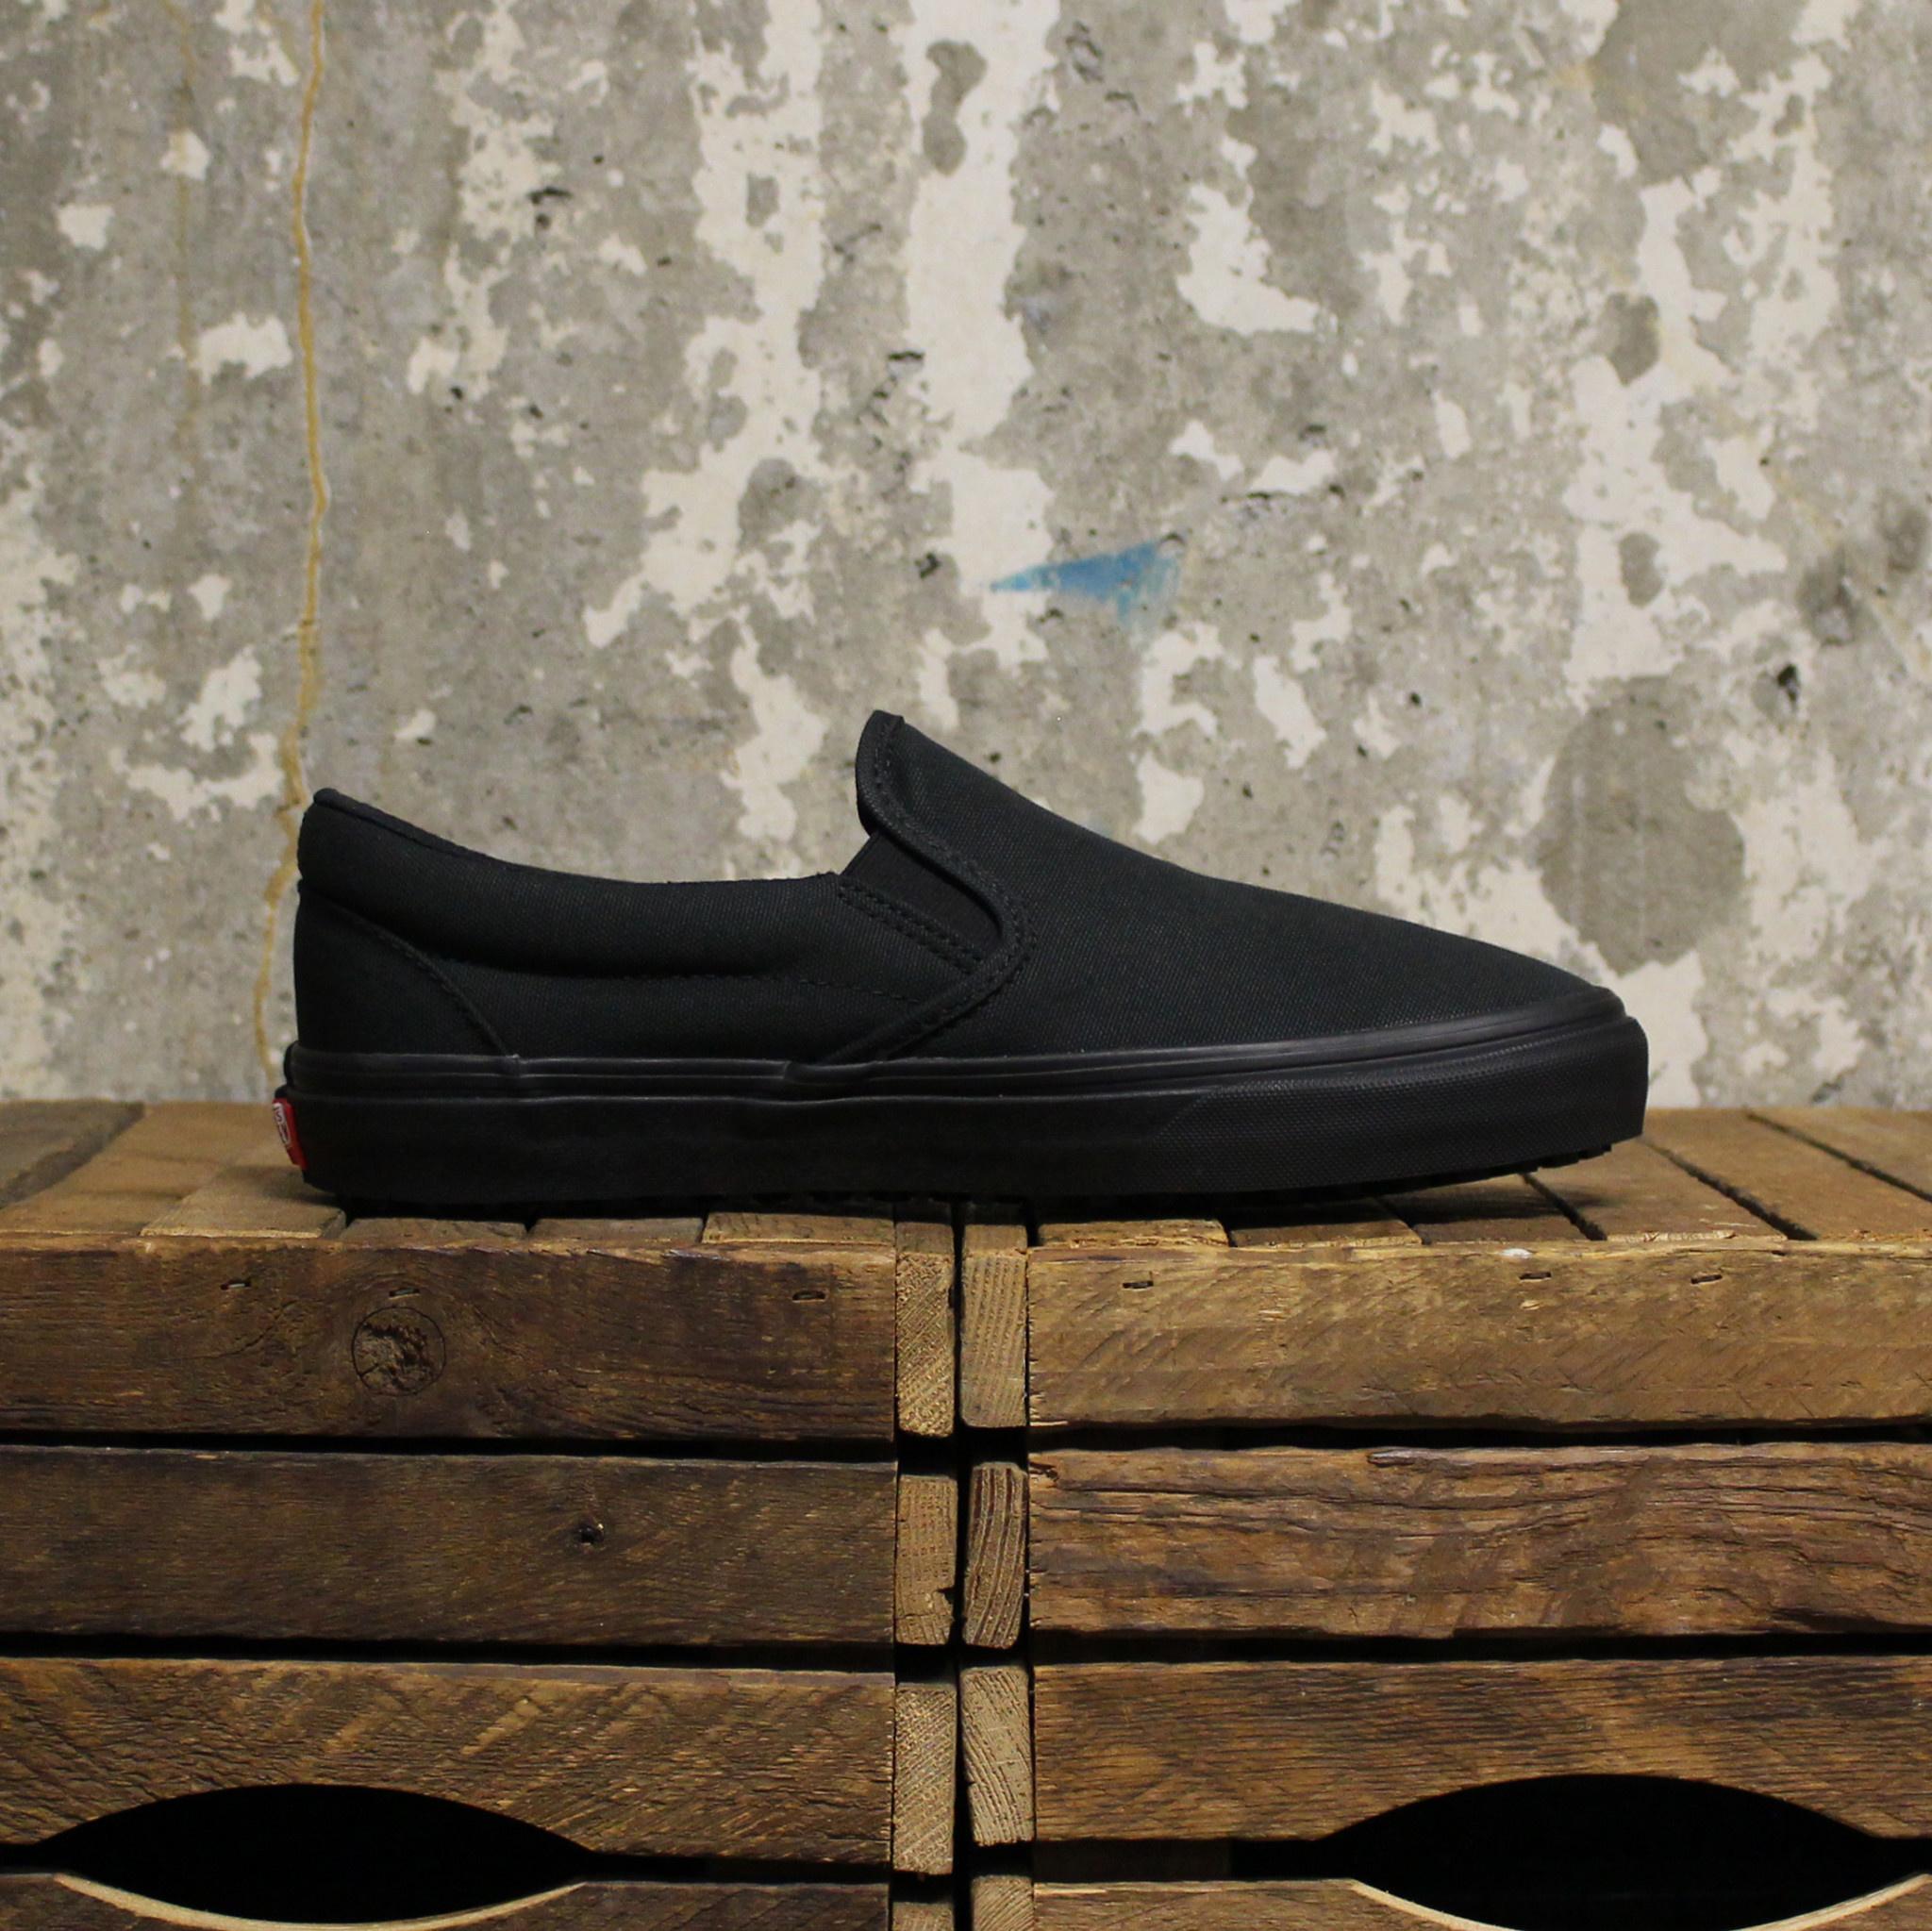 Vans Vans Classic Slip-On UC (Made for the Makers) - Black/Black/Black